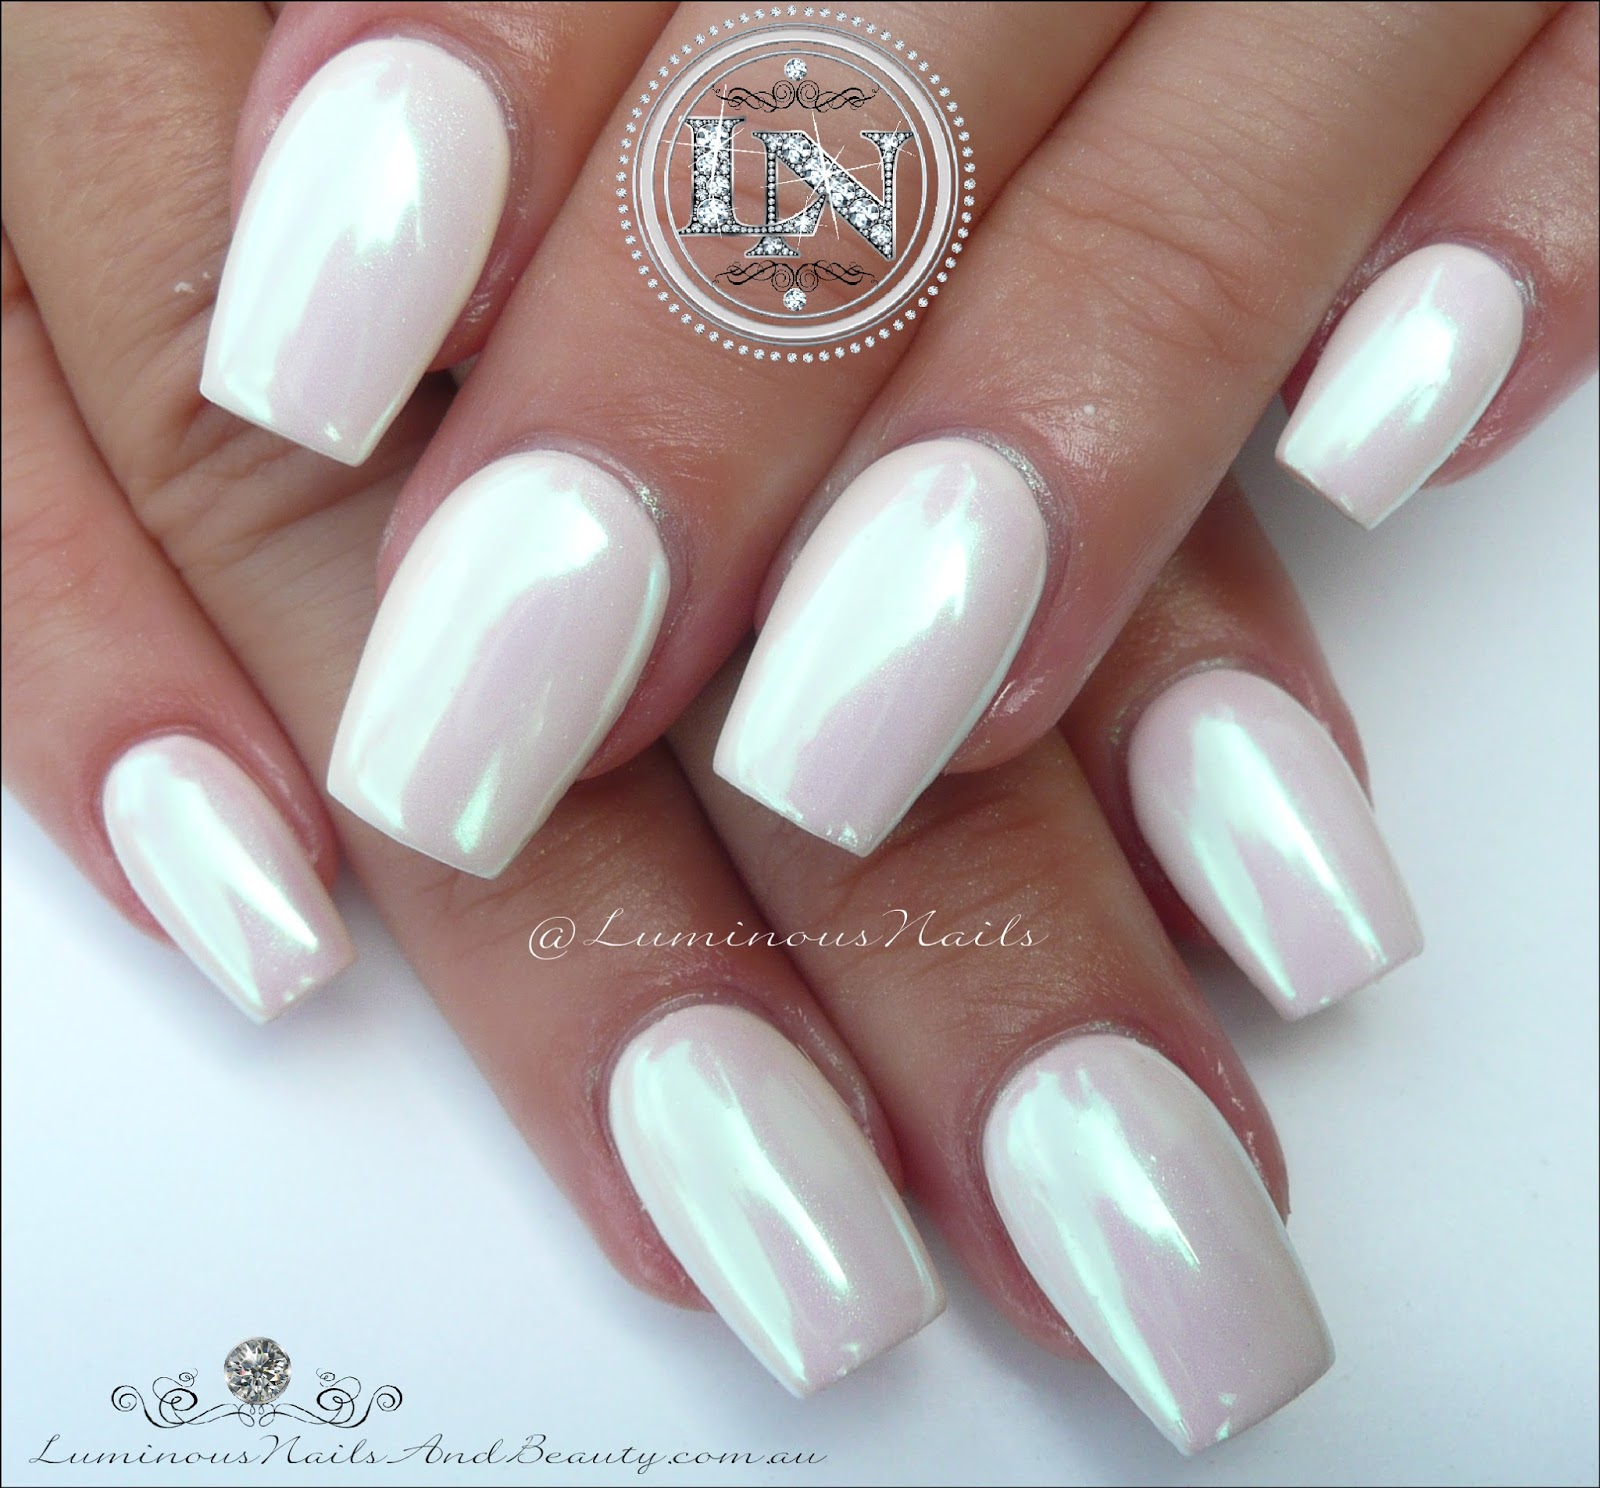 Luminous Nails: Gorgeous Pearly Chrome White Acrylic & Gel Nails.